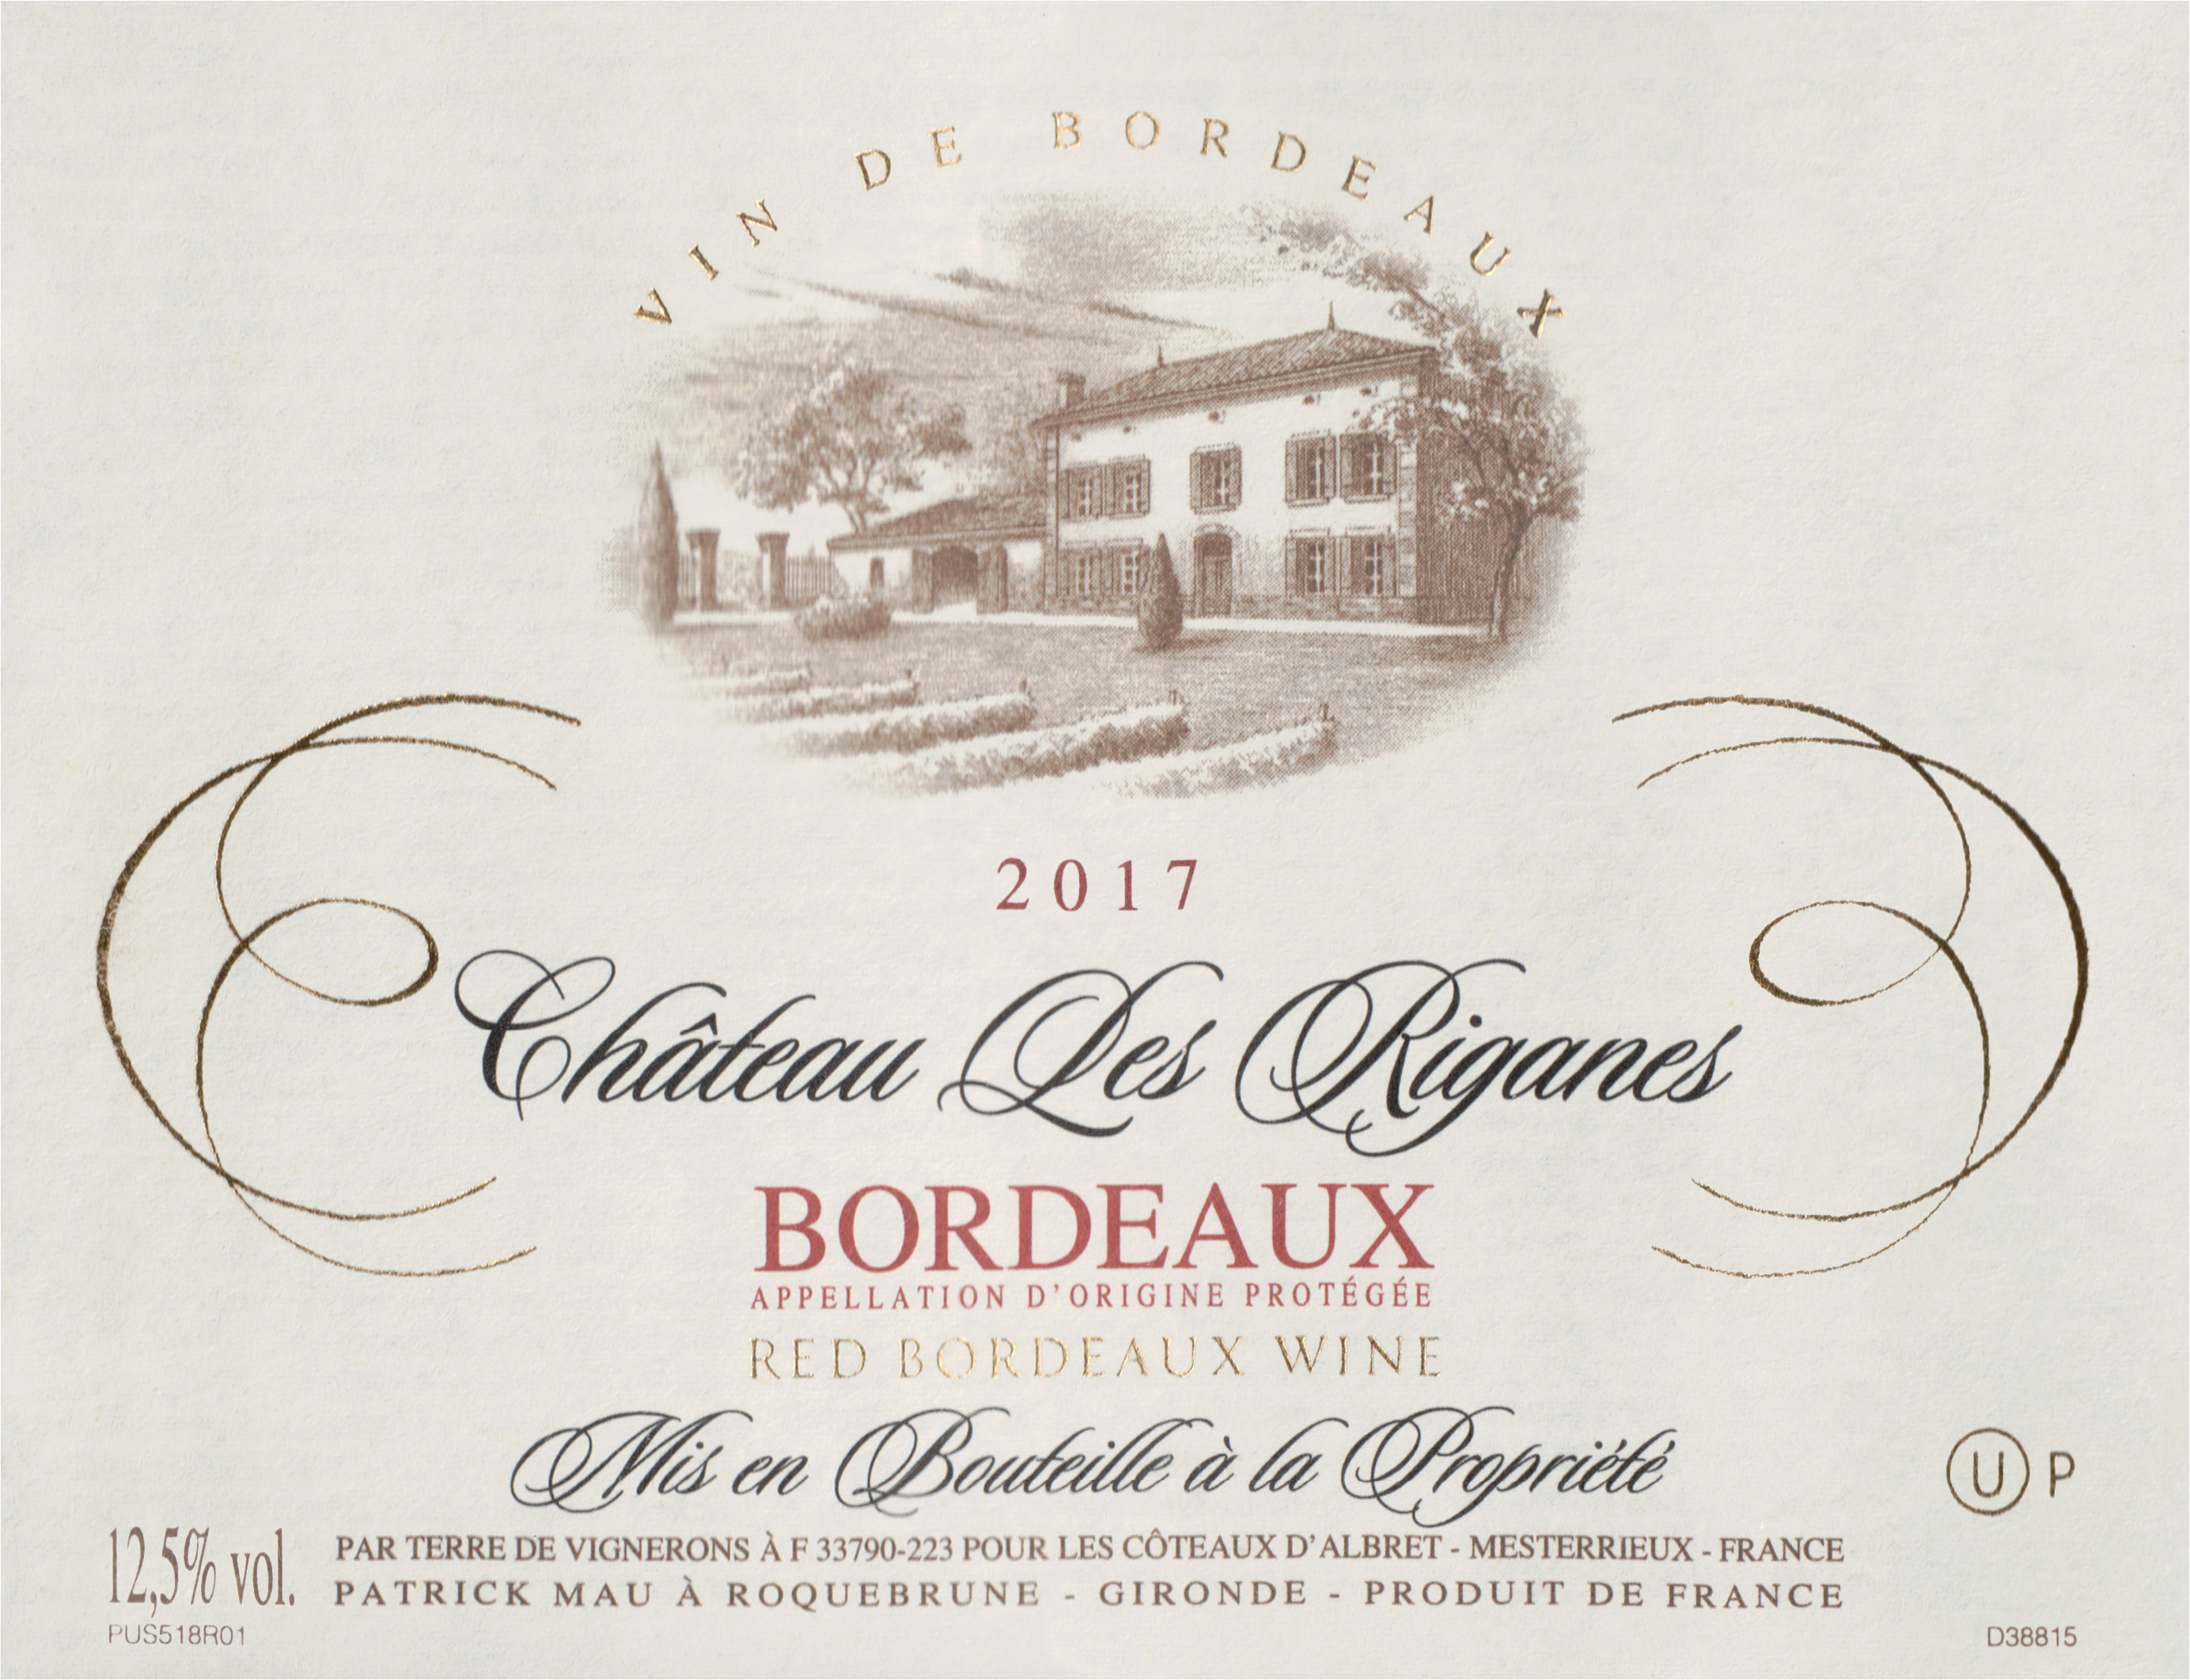 Chateau Les Riganes 2017